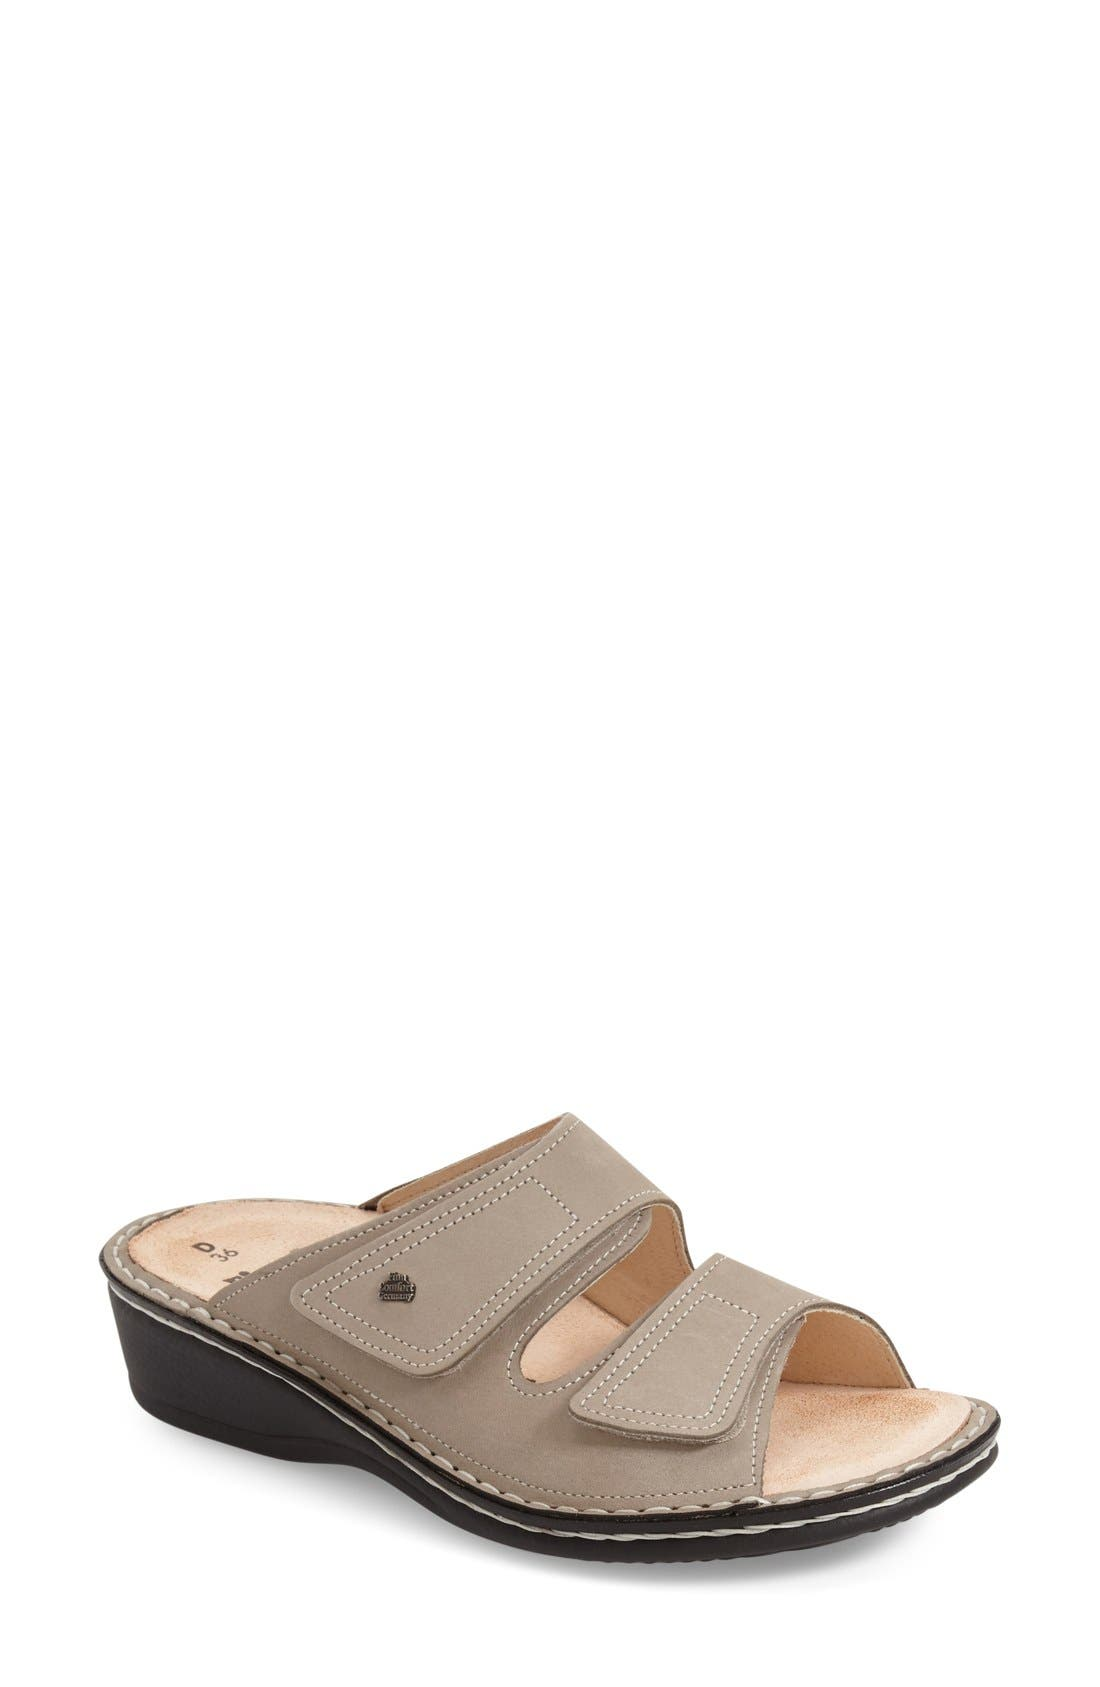 Main Image - Finn 'Jamaica' Sandal (Women)